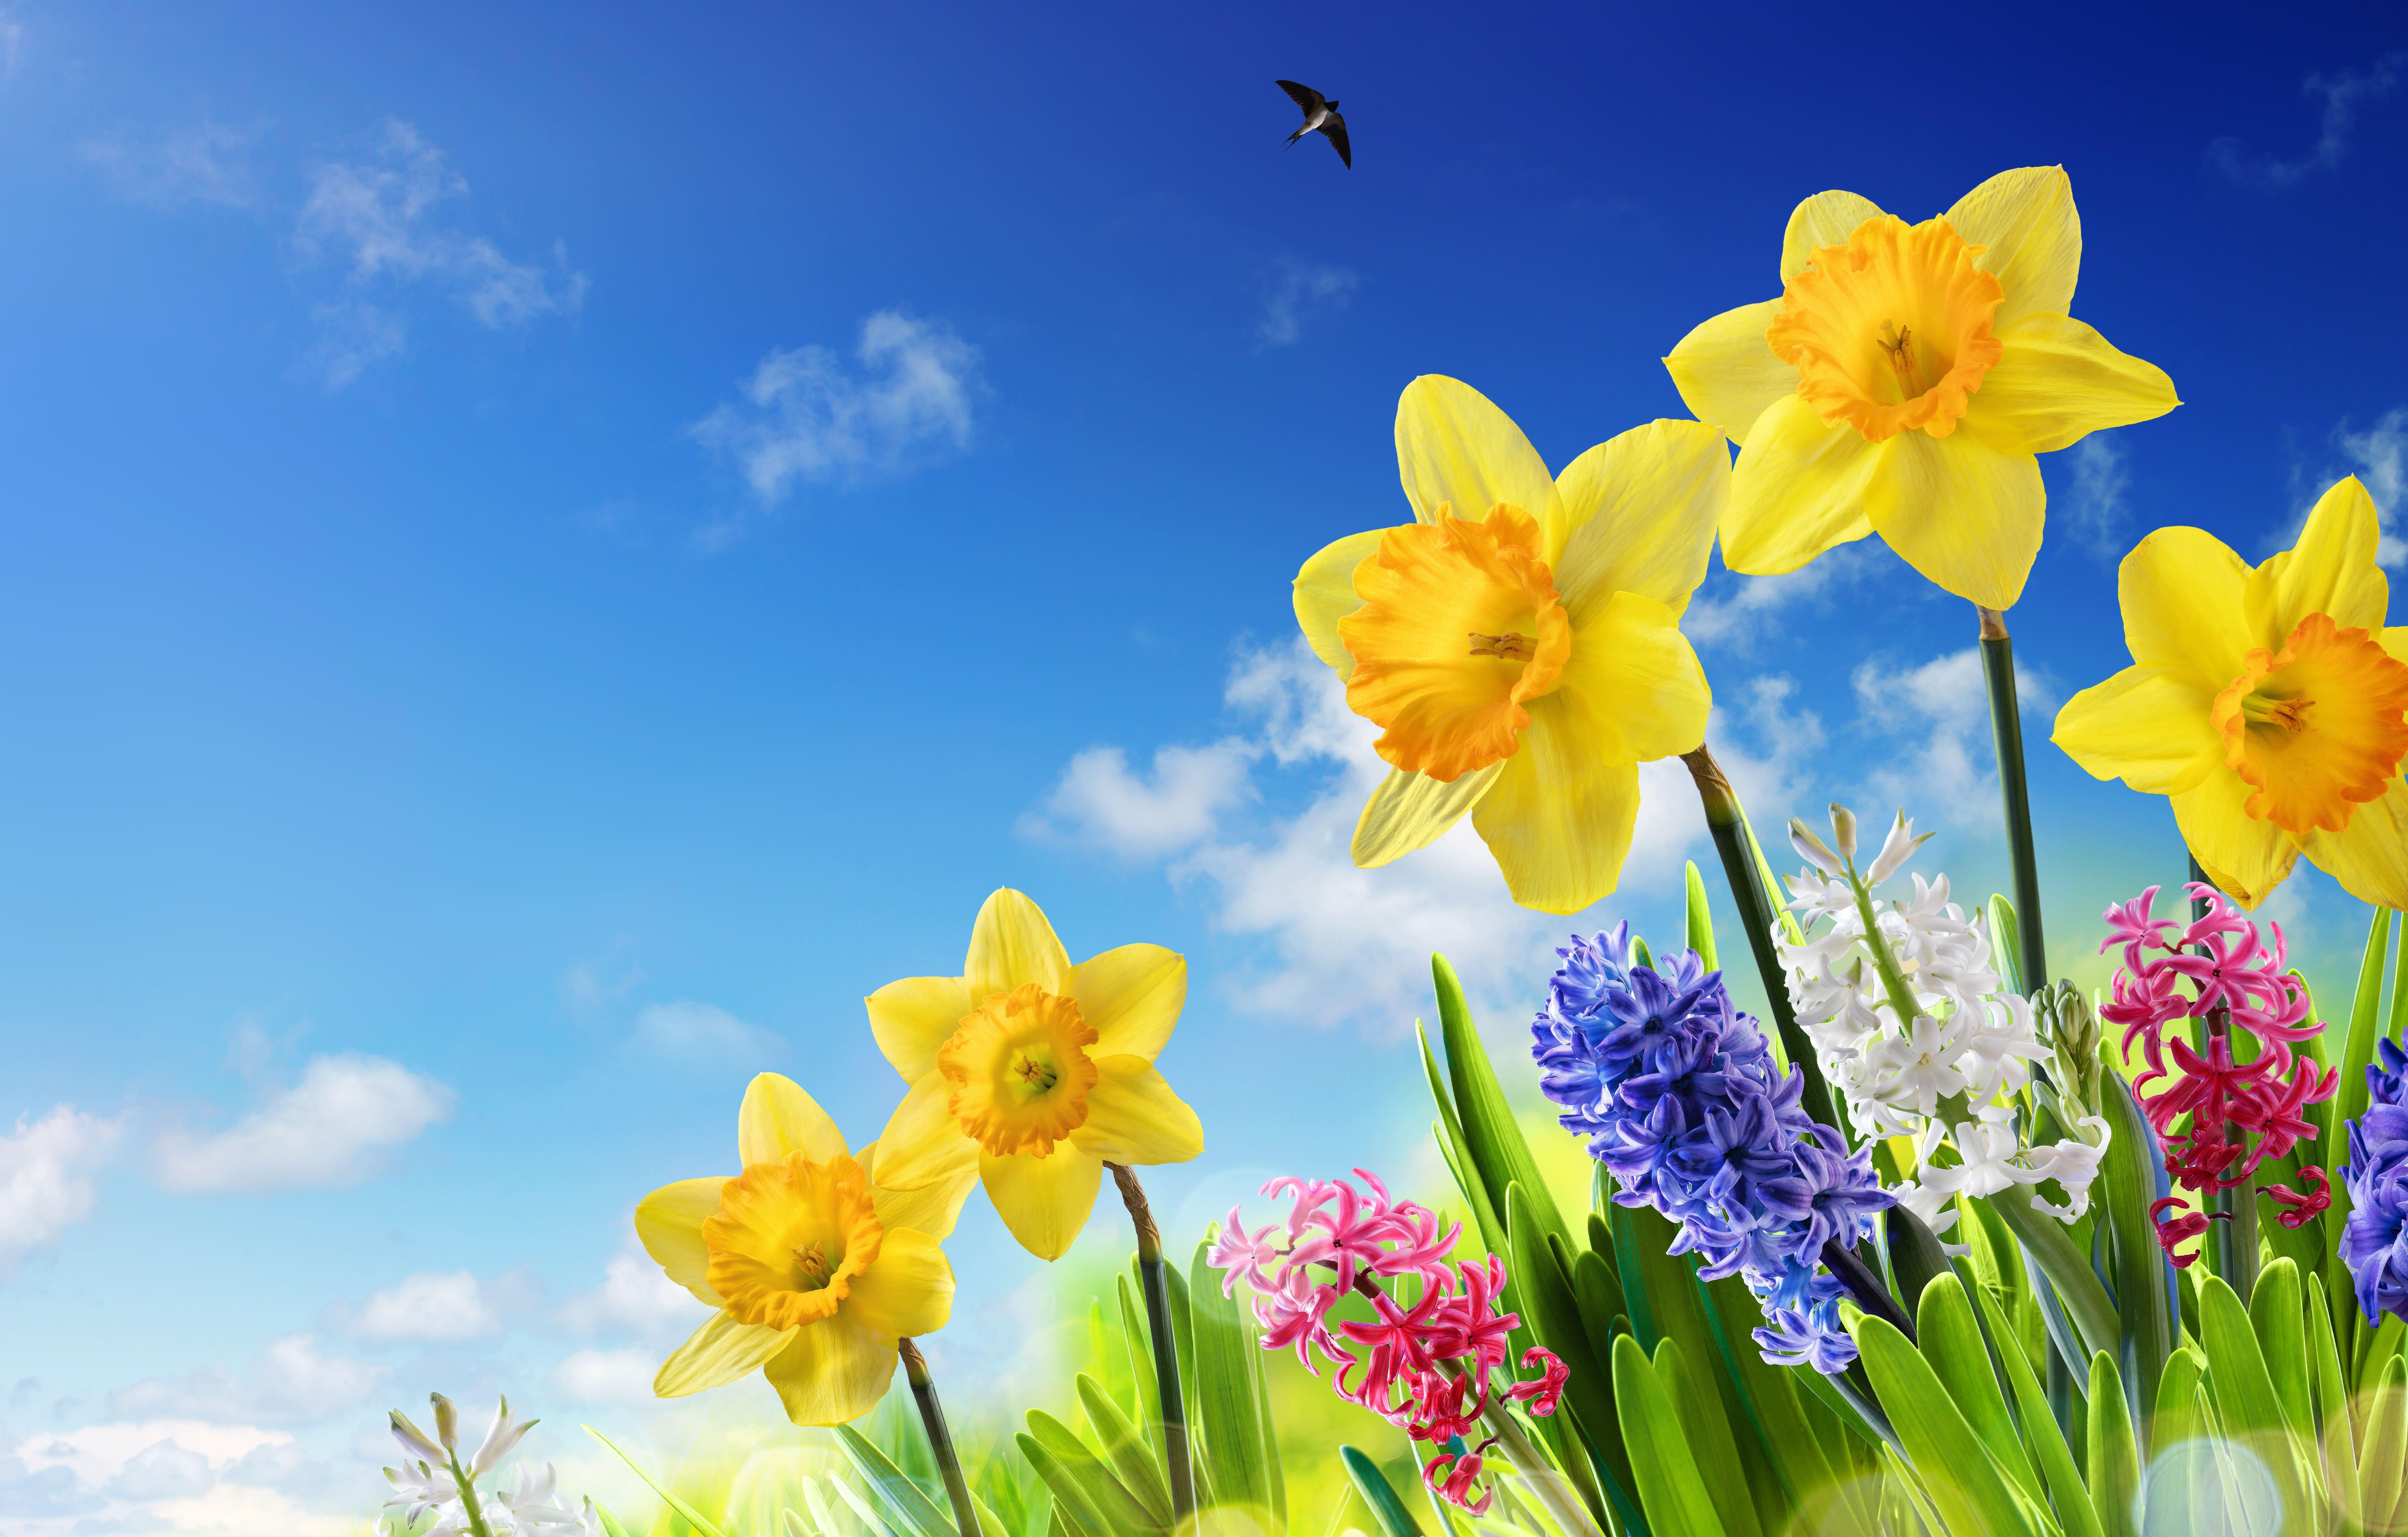 daffodils-photo-67